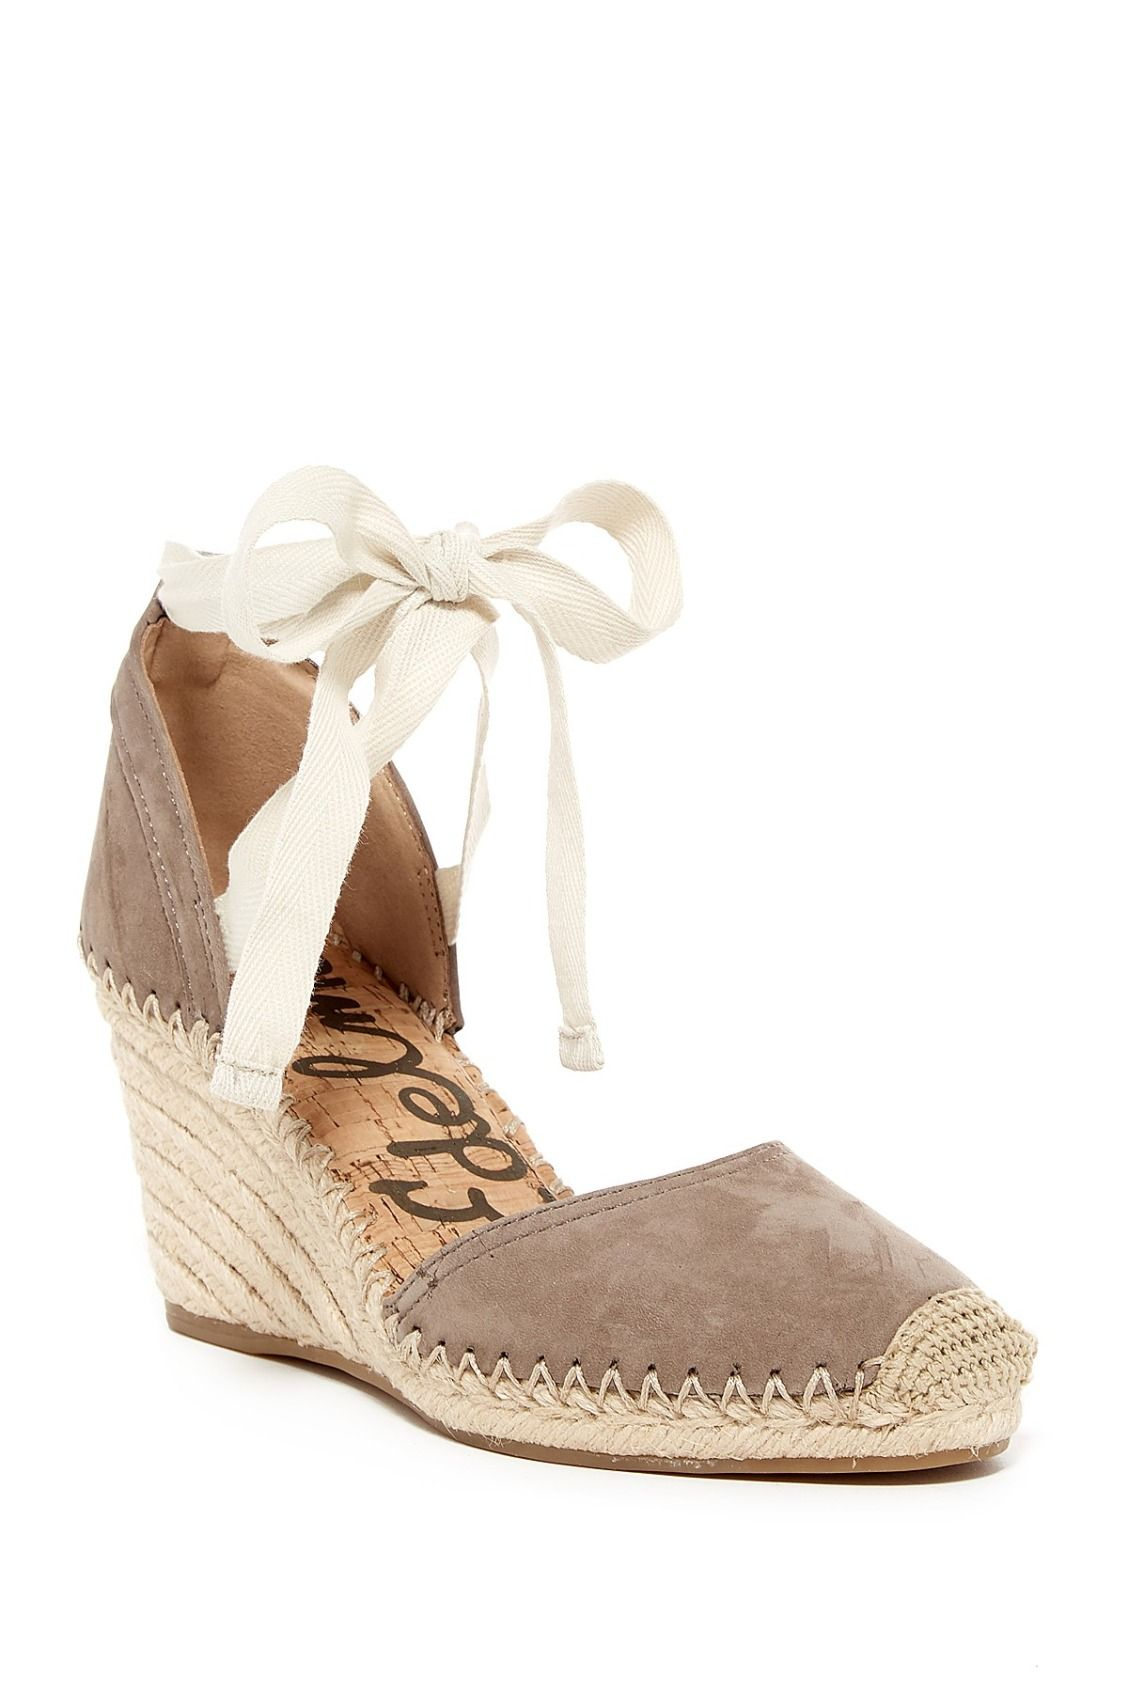 80238dbf0bd Sam Edelman | Patsy Espadrille Wedge | Shoes | Espadrilles, Shoes ...